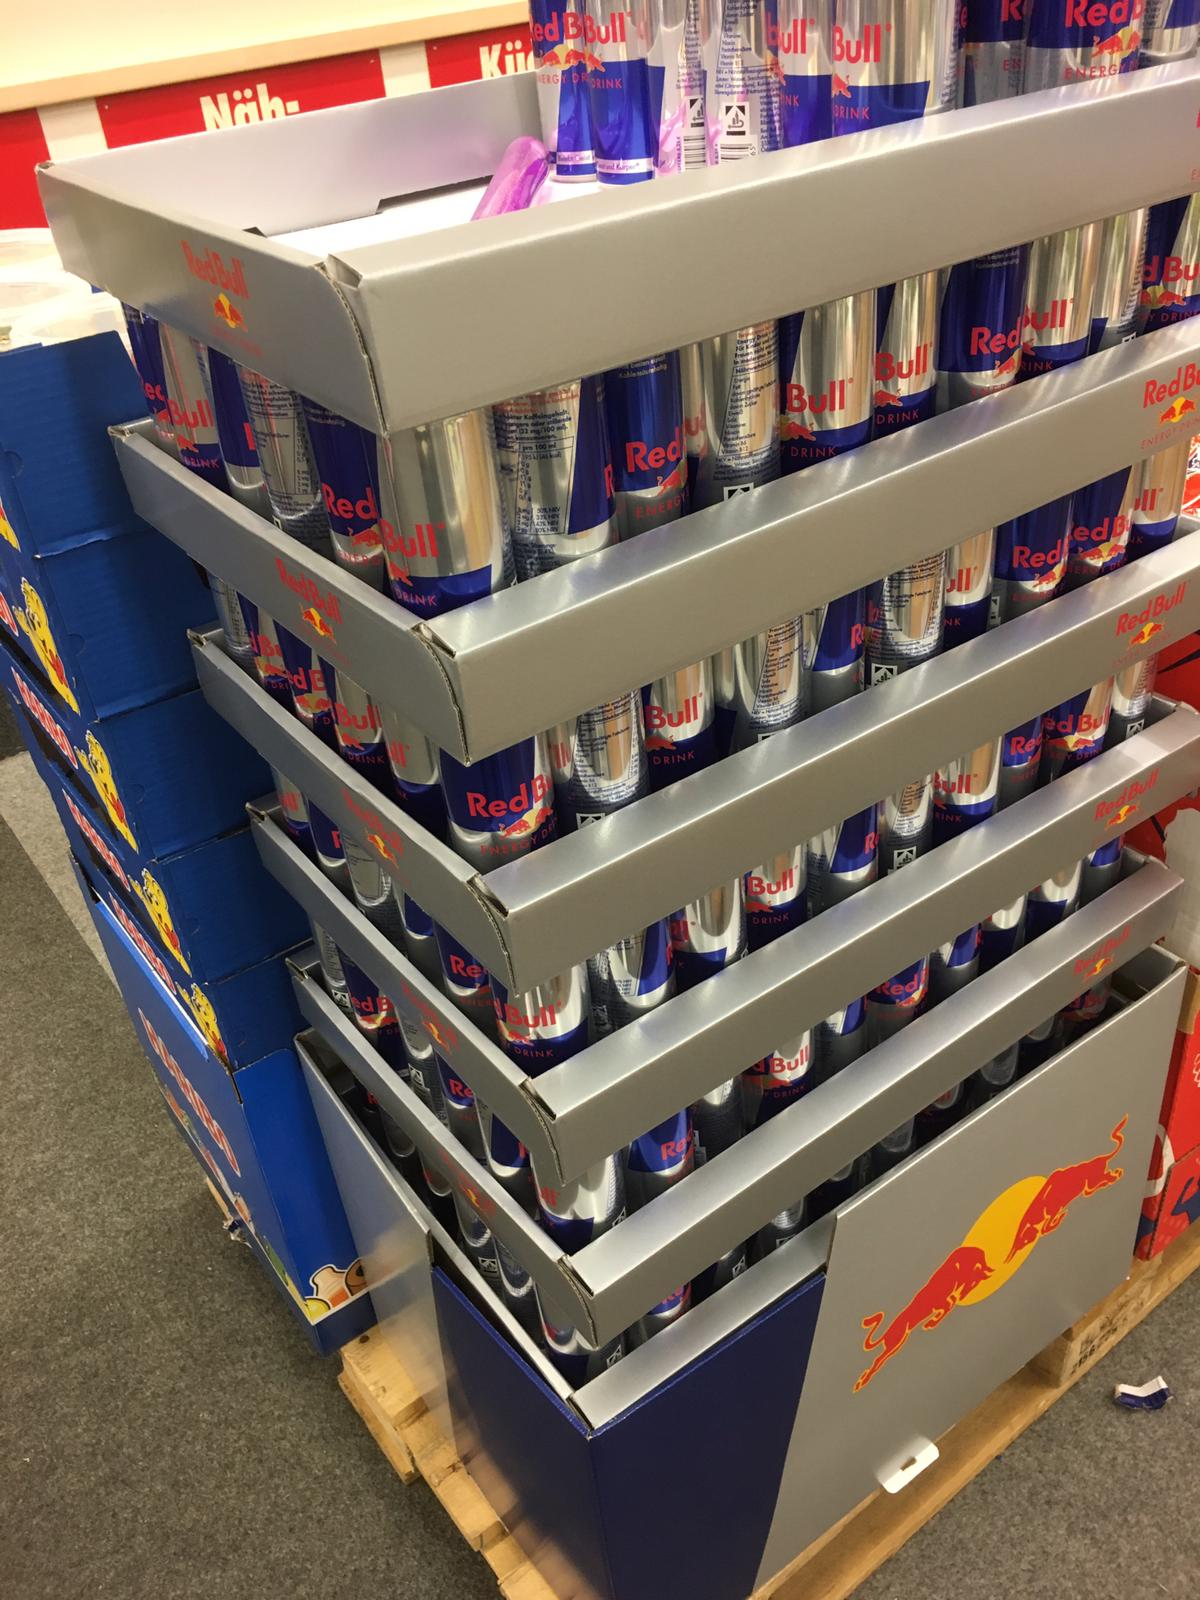 Hot For Red BullRedbull Classic And Other Energy Drinks Available - Buy Bulk Energy Drinks